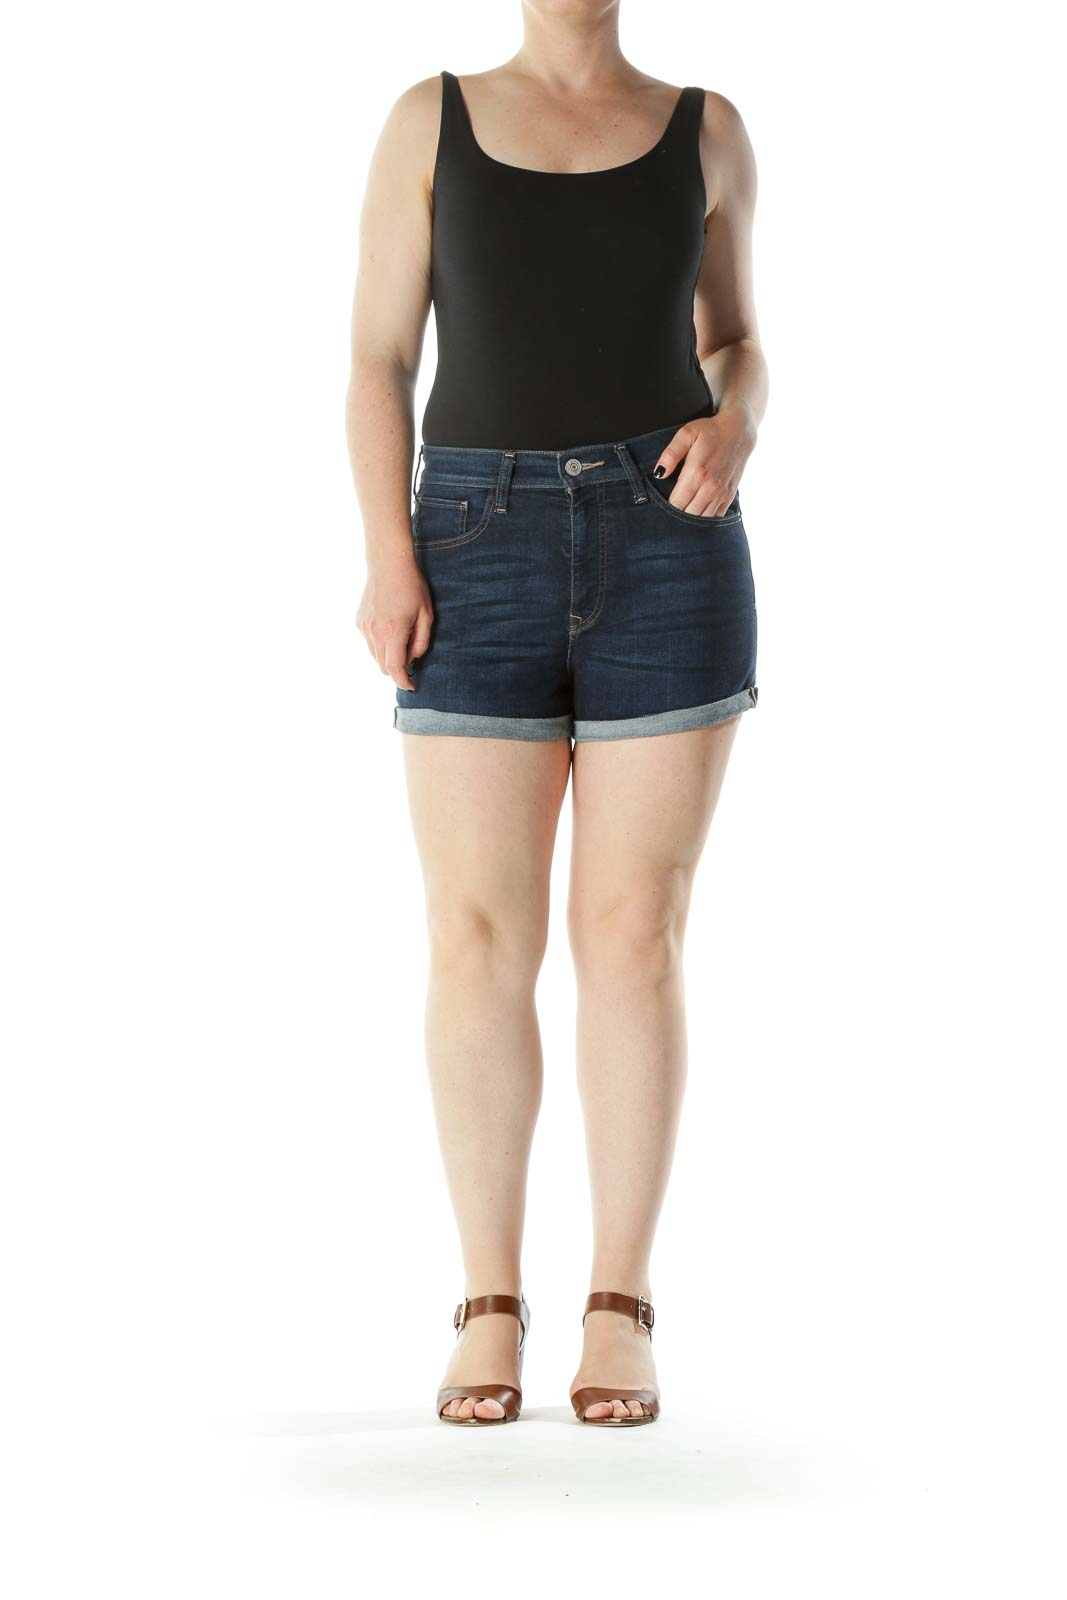 Blue Dark-Wash Pocketed Stretch High-Waisted Denim Shorts